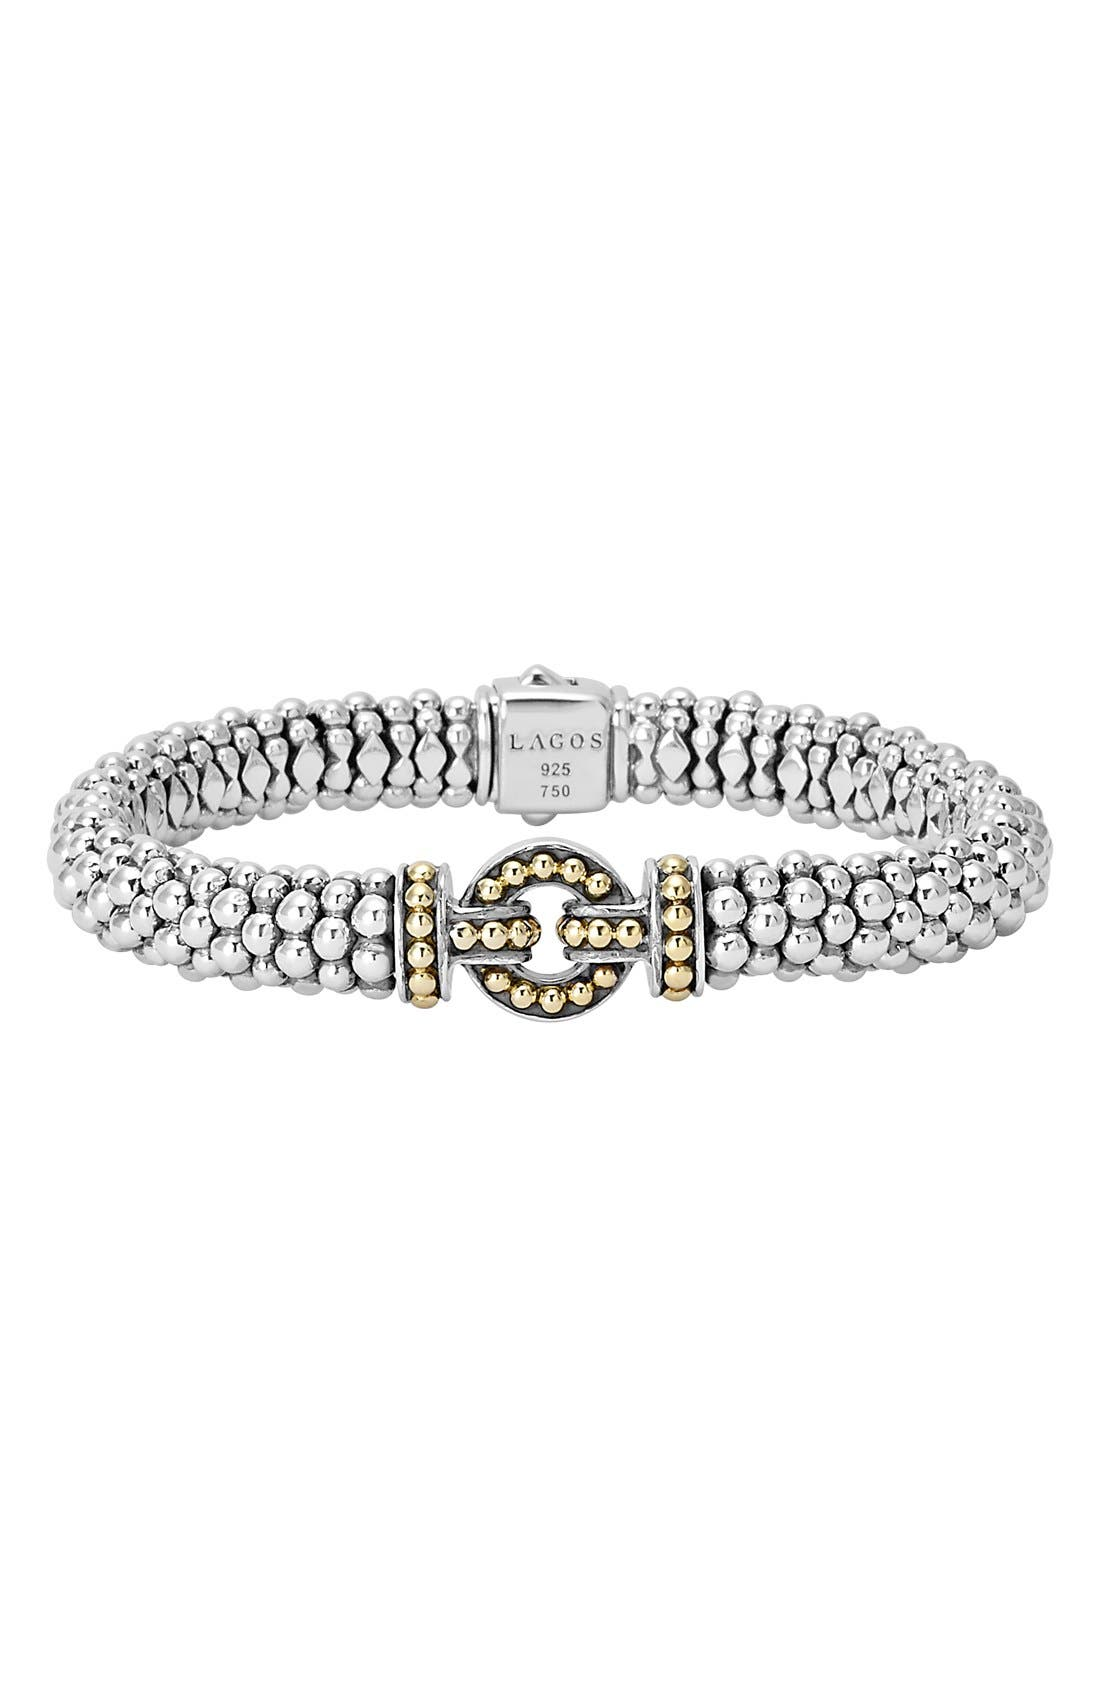 'Enso' Two-Tone Rope Caviar Bracelet,                             Main thumbnail 1, color,                             SILVER/ GOLD